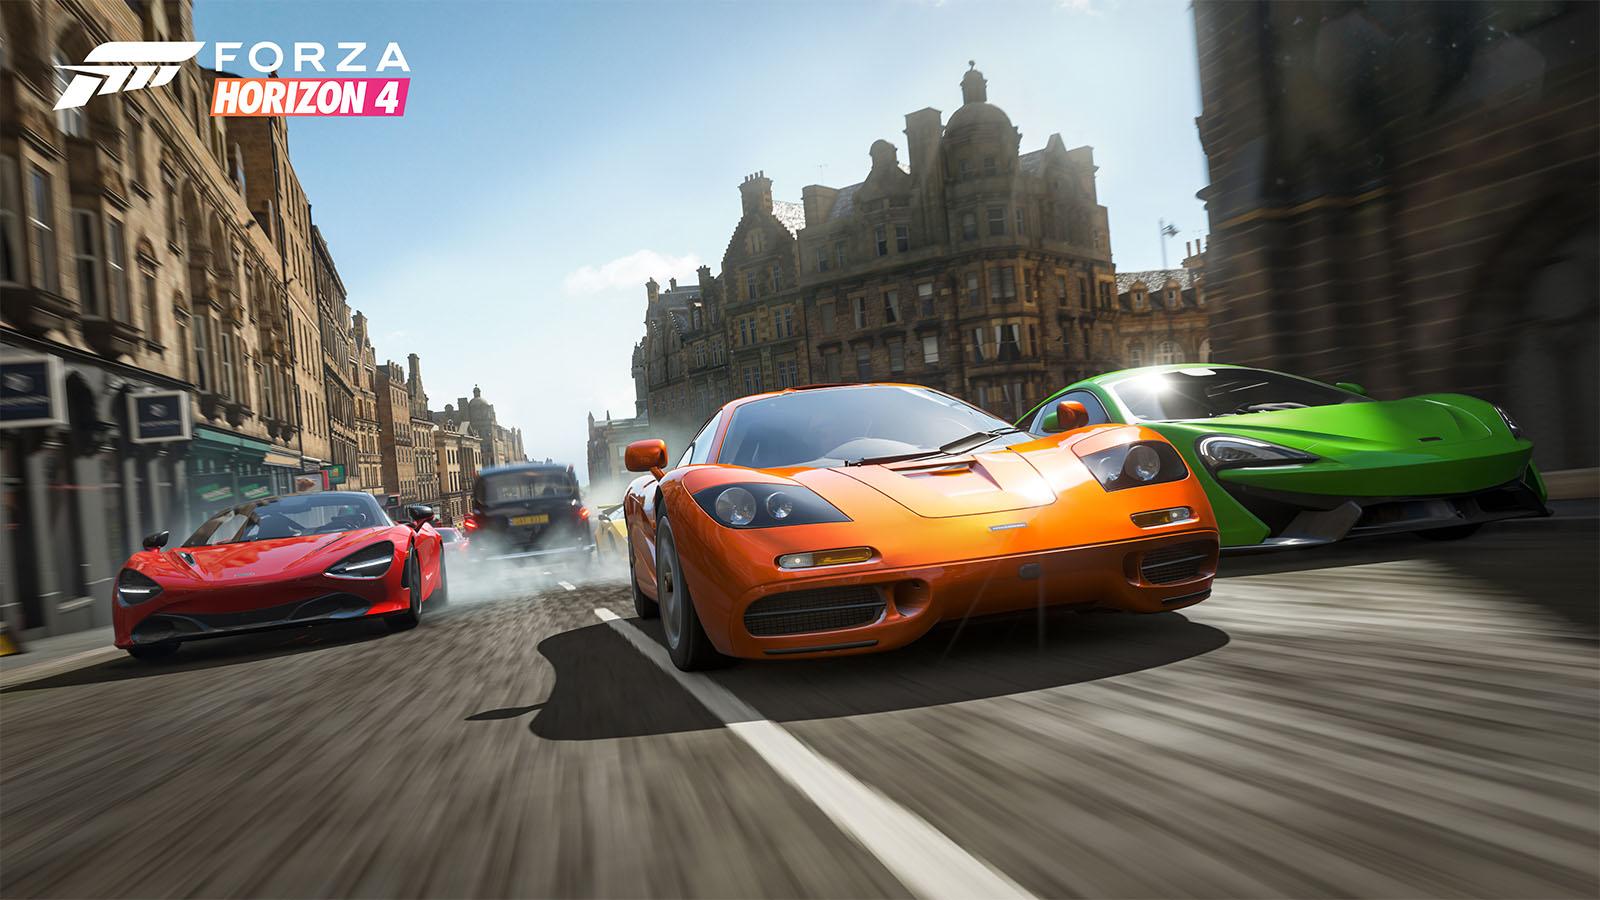 Forza Horizon 4 Series 29 Summer